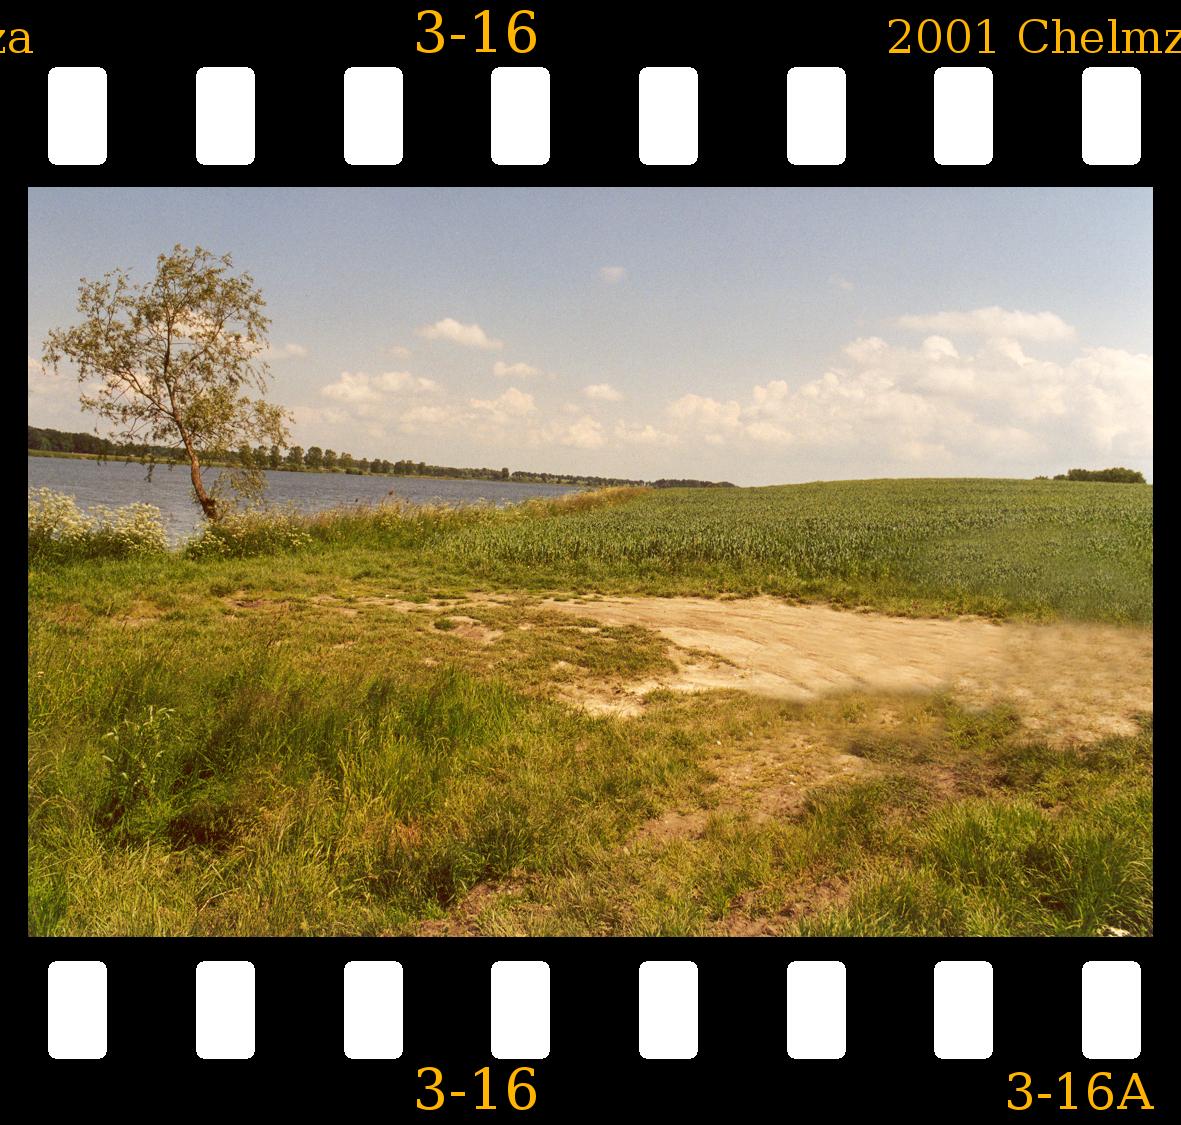 3-16A Chelmza Jezioro Chelmzynskie June 2001